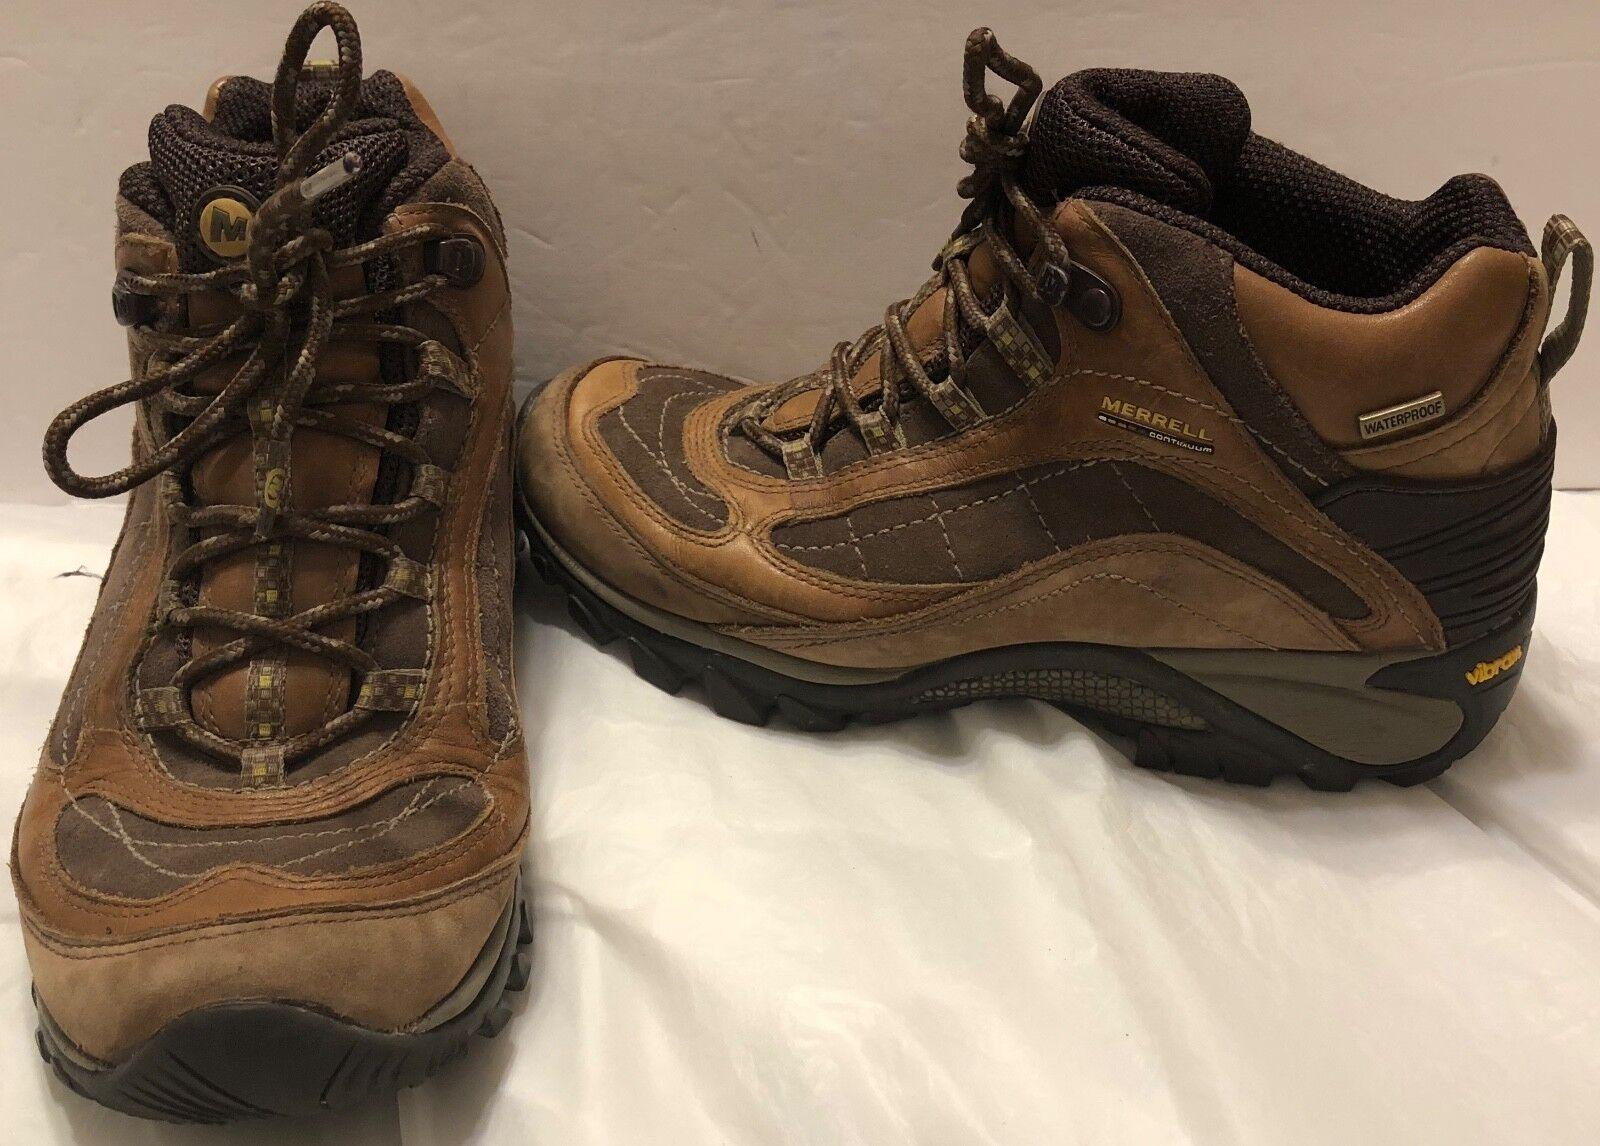 Merrell Siren Waterproof Mid Leather Marron Bottes Sz 8 Trail Hiking Vibram Soles